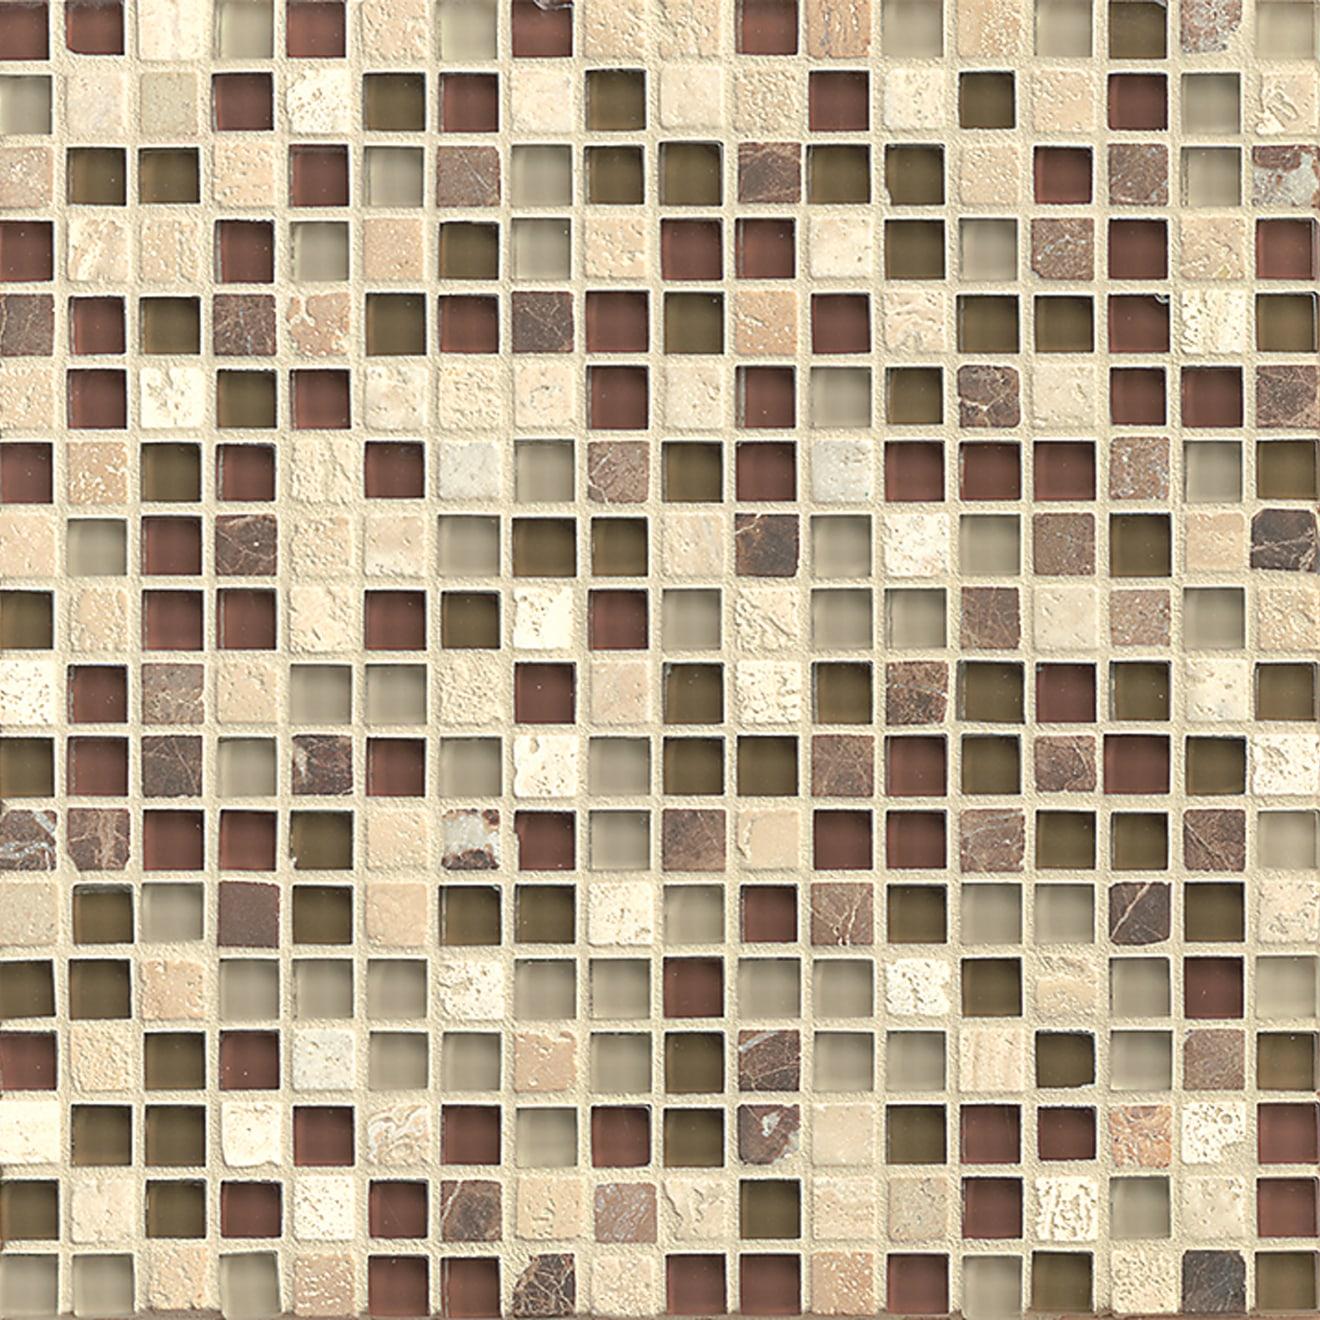 Eclipse 5 8 X 5 8 Wall Mosaic In Merlot Bedrosians Tile Stone